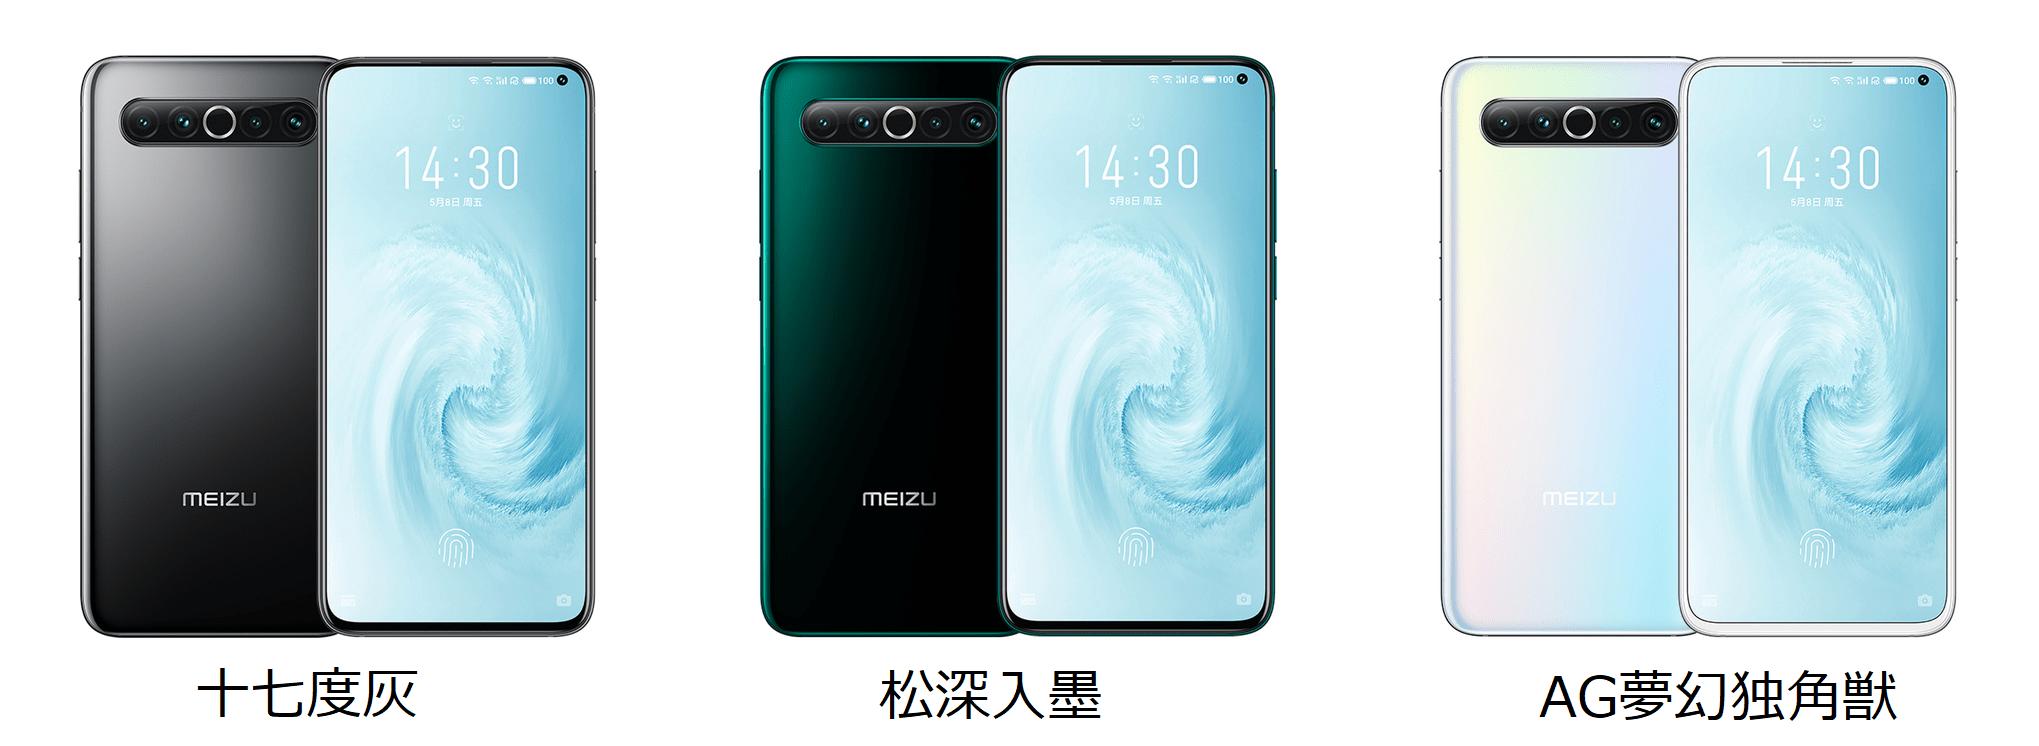 Meizu 17のカラーにおける英語名での正式名称が明らかに